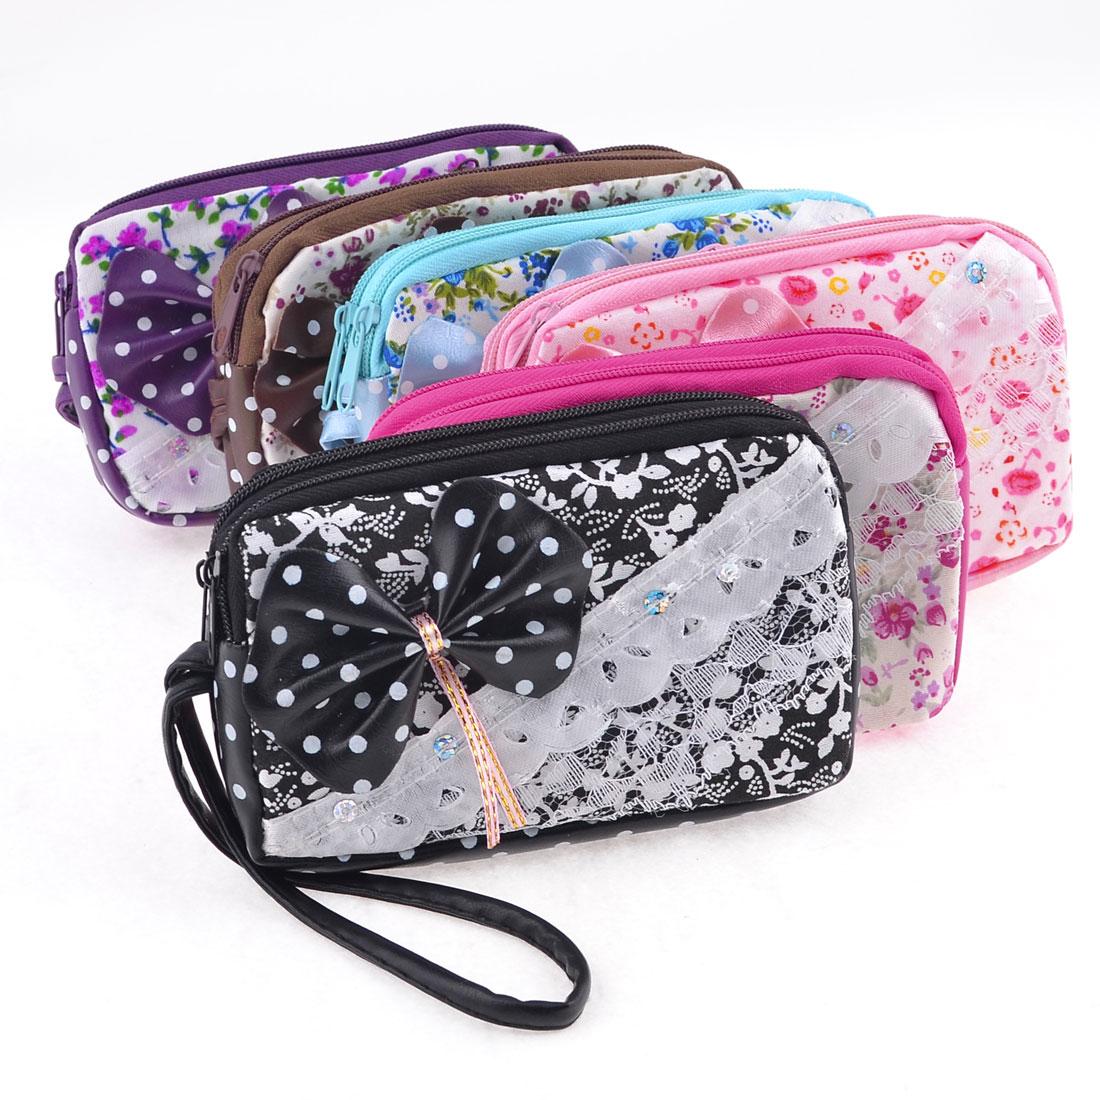 6 Pcs Flowers White Dots Pattern Double Zipper Closure Handbag